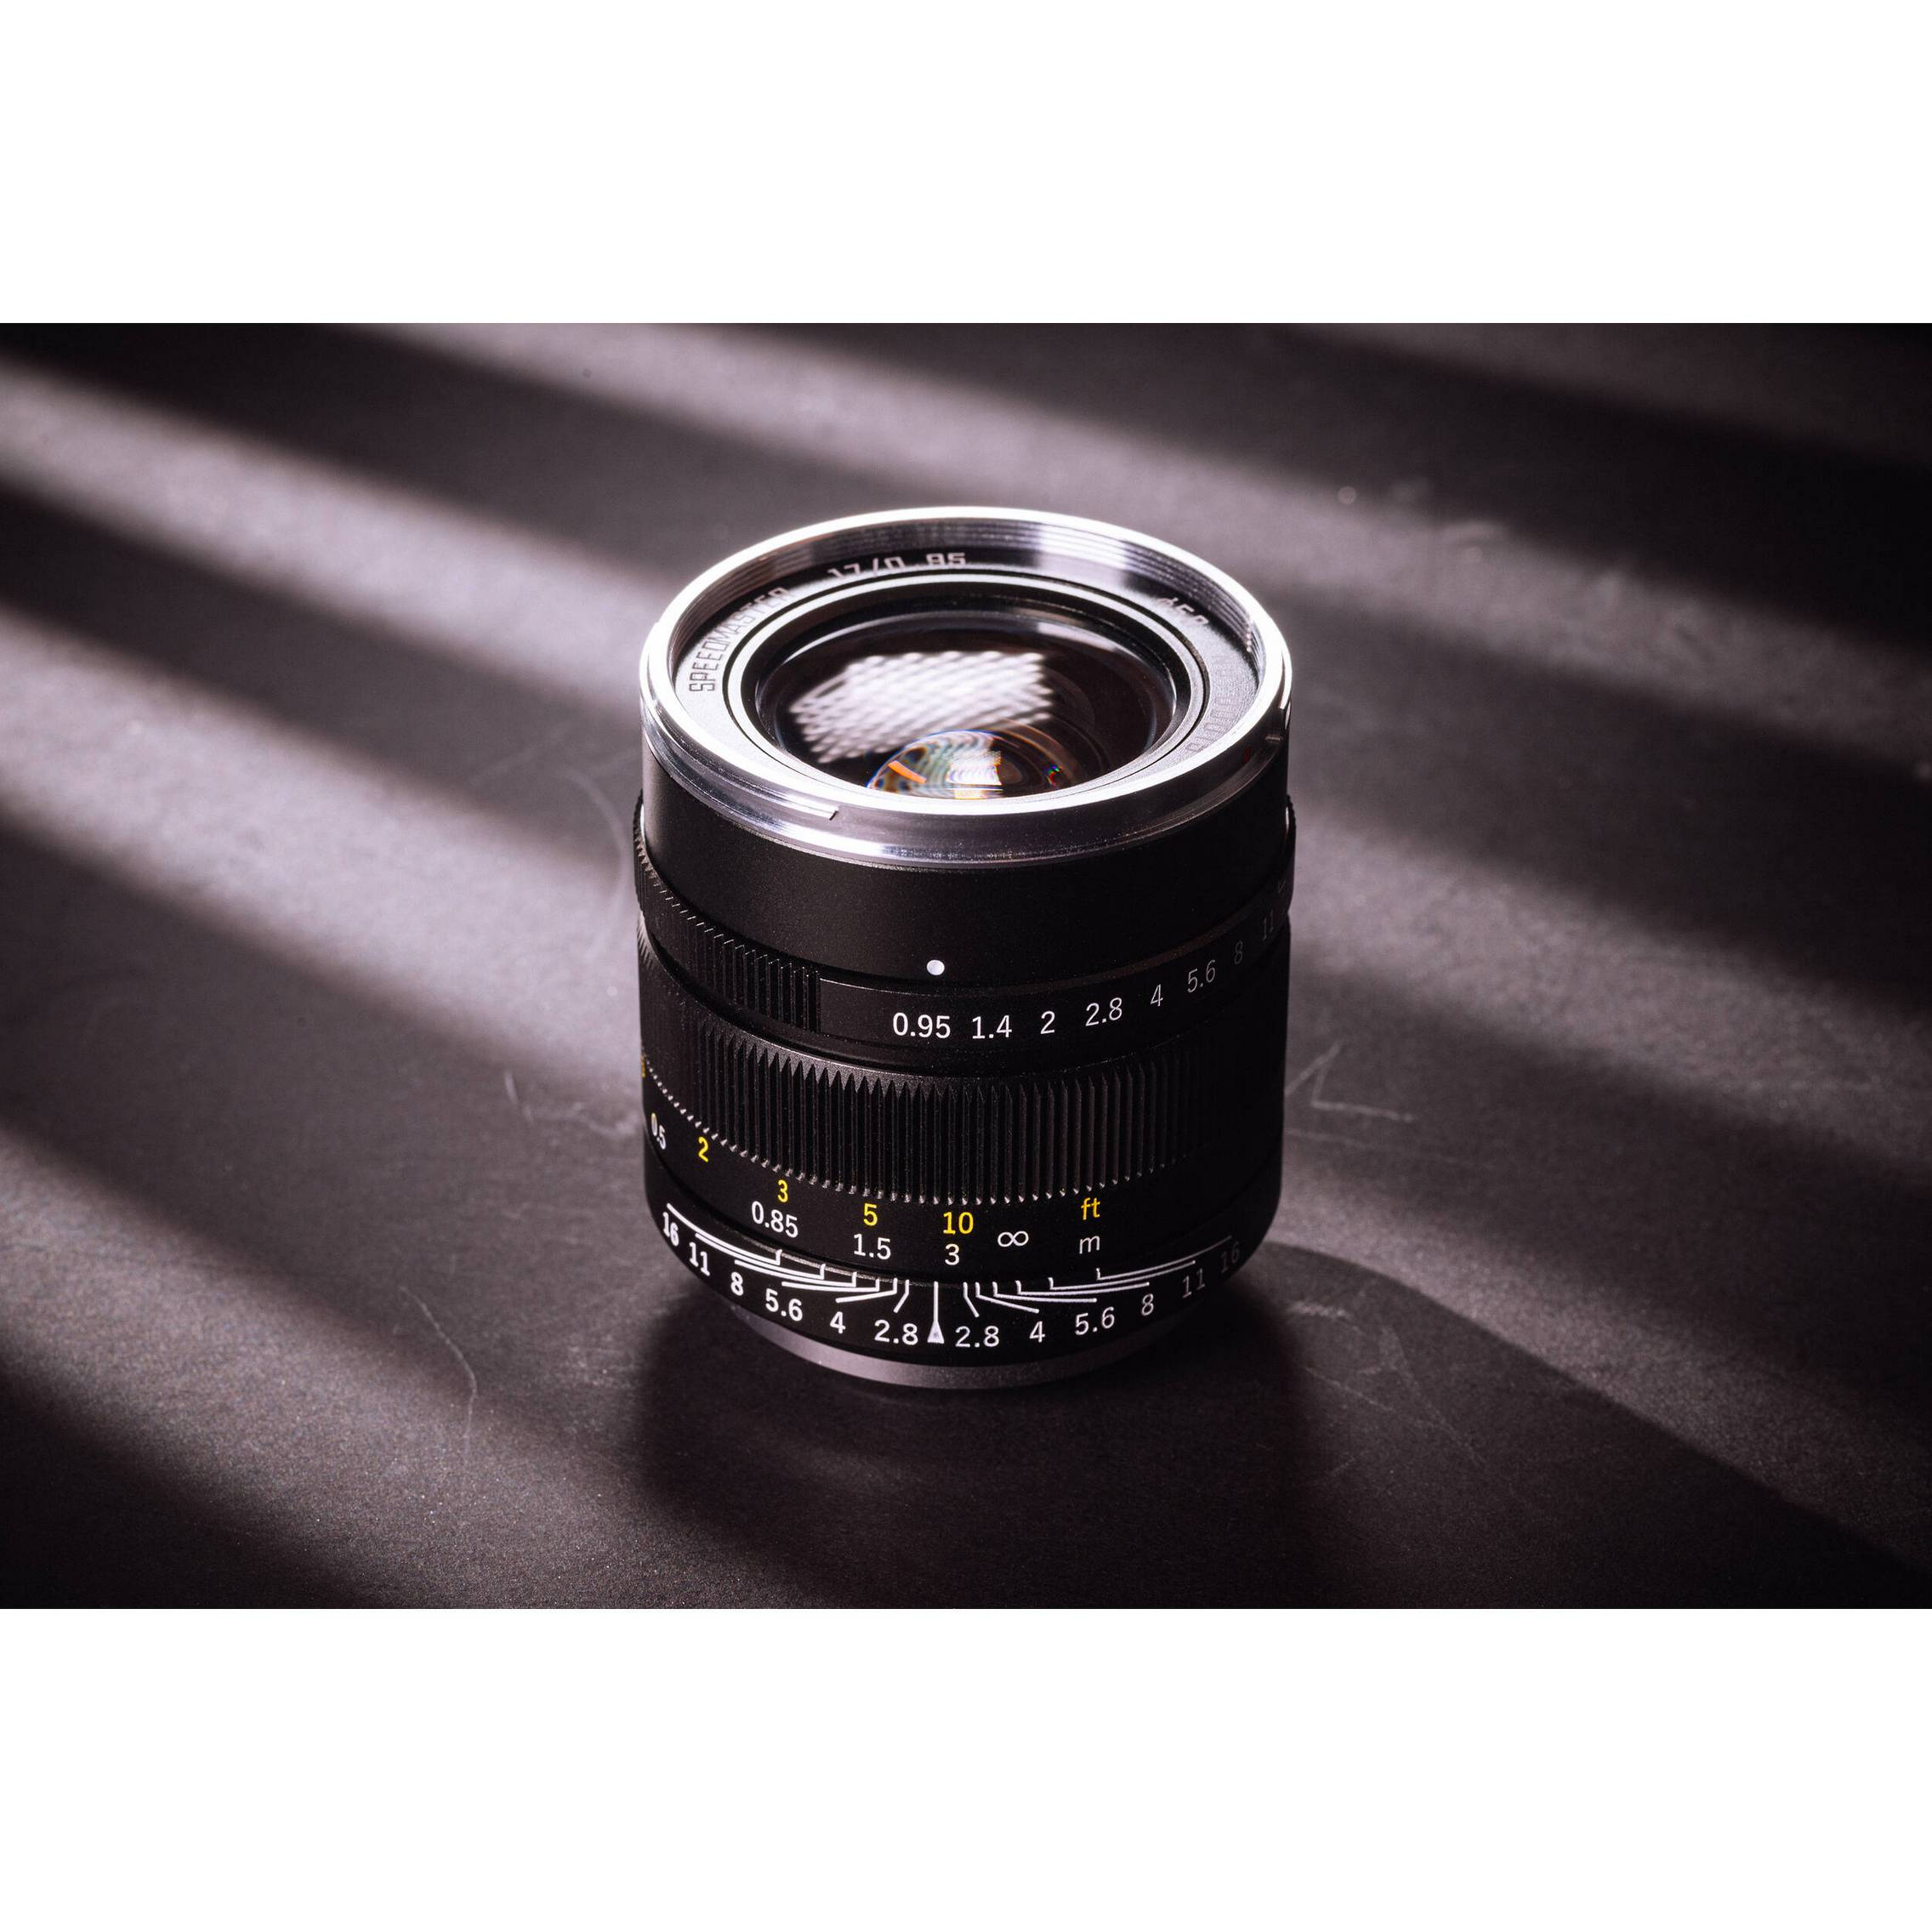 Mitakon Zhongyi Speedmaster 17mm f 0.95